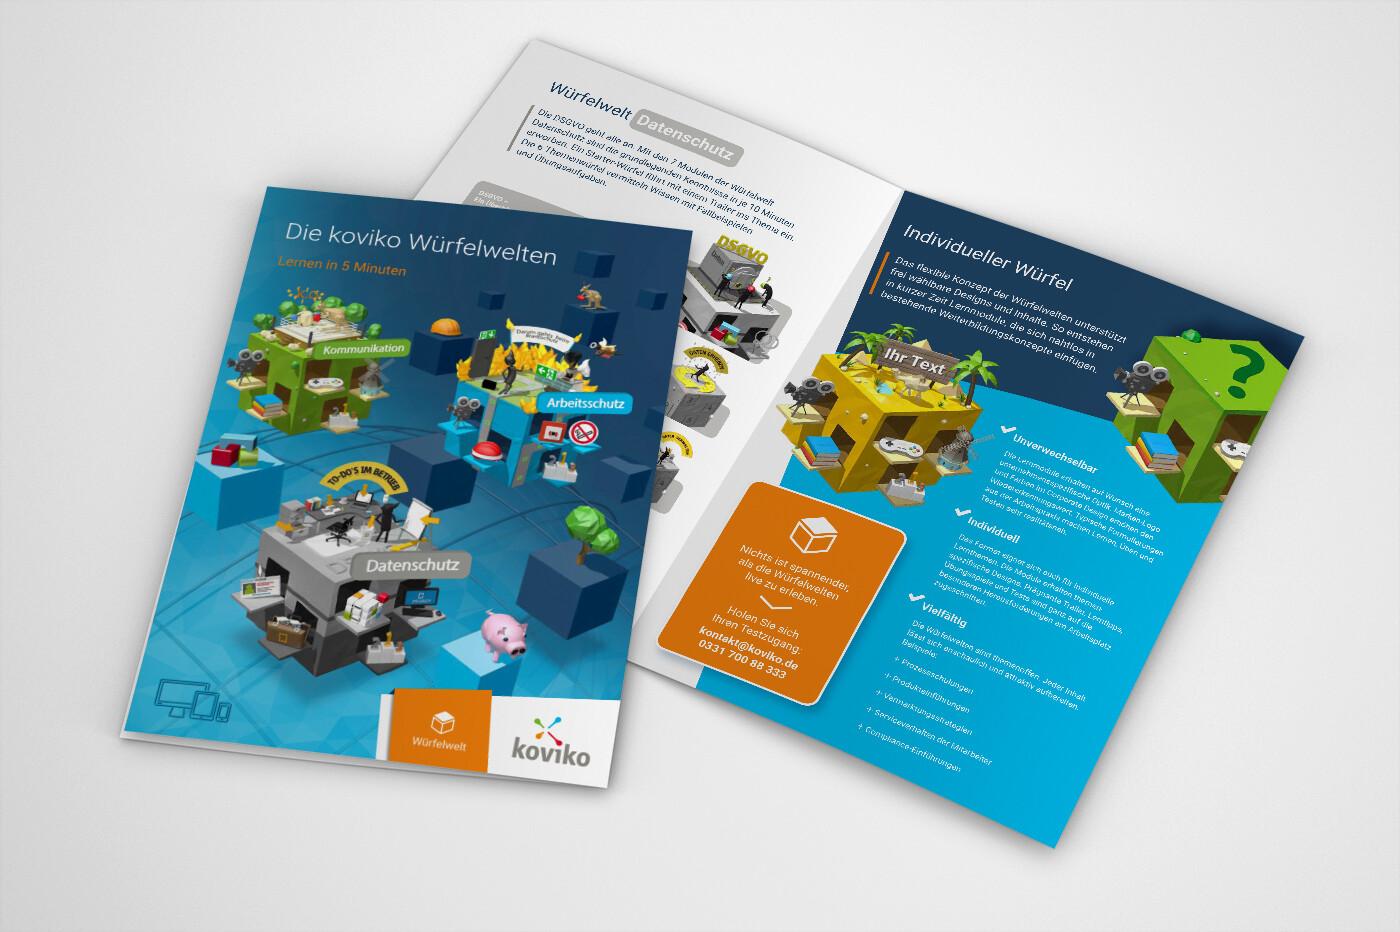 koviko - A4 brochure